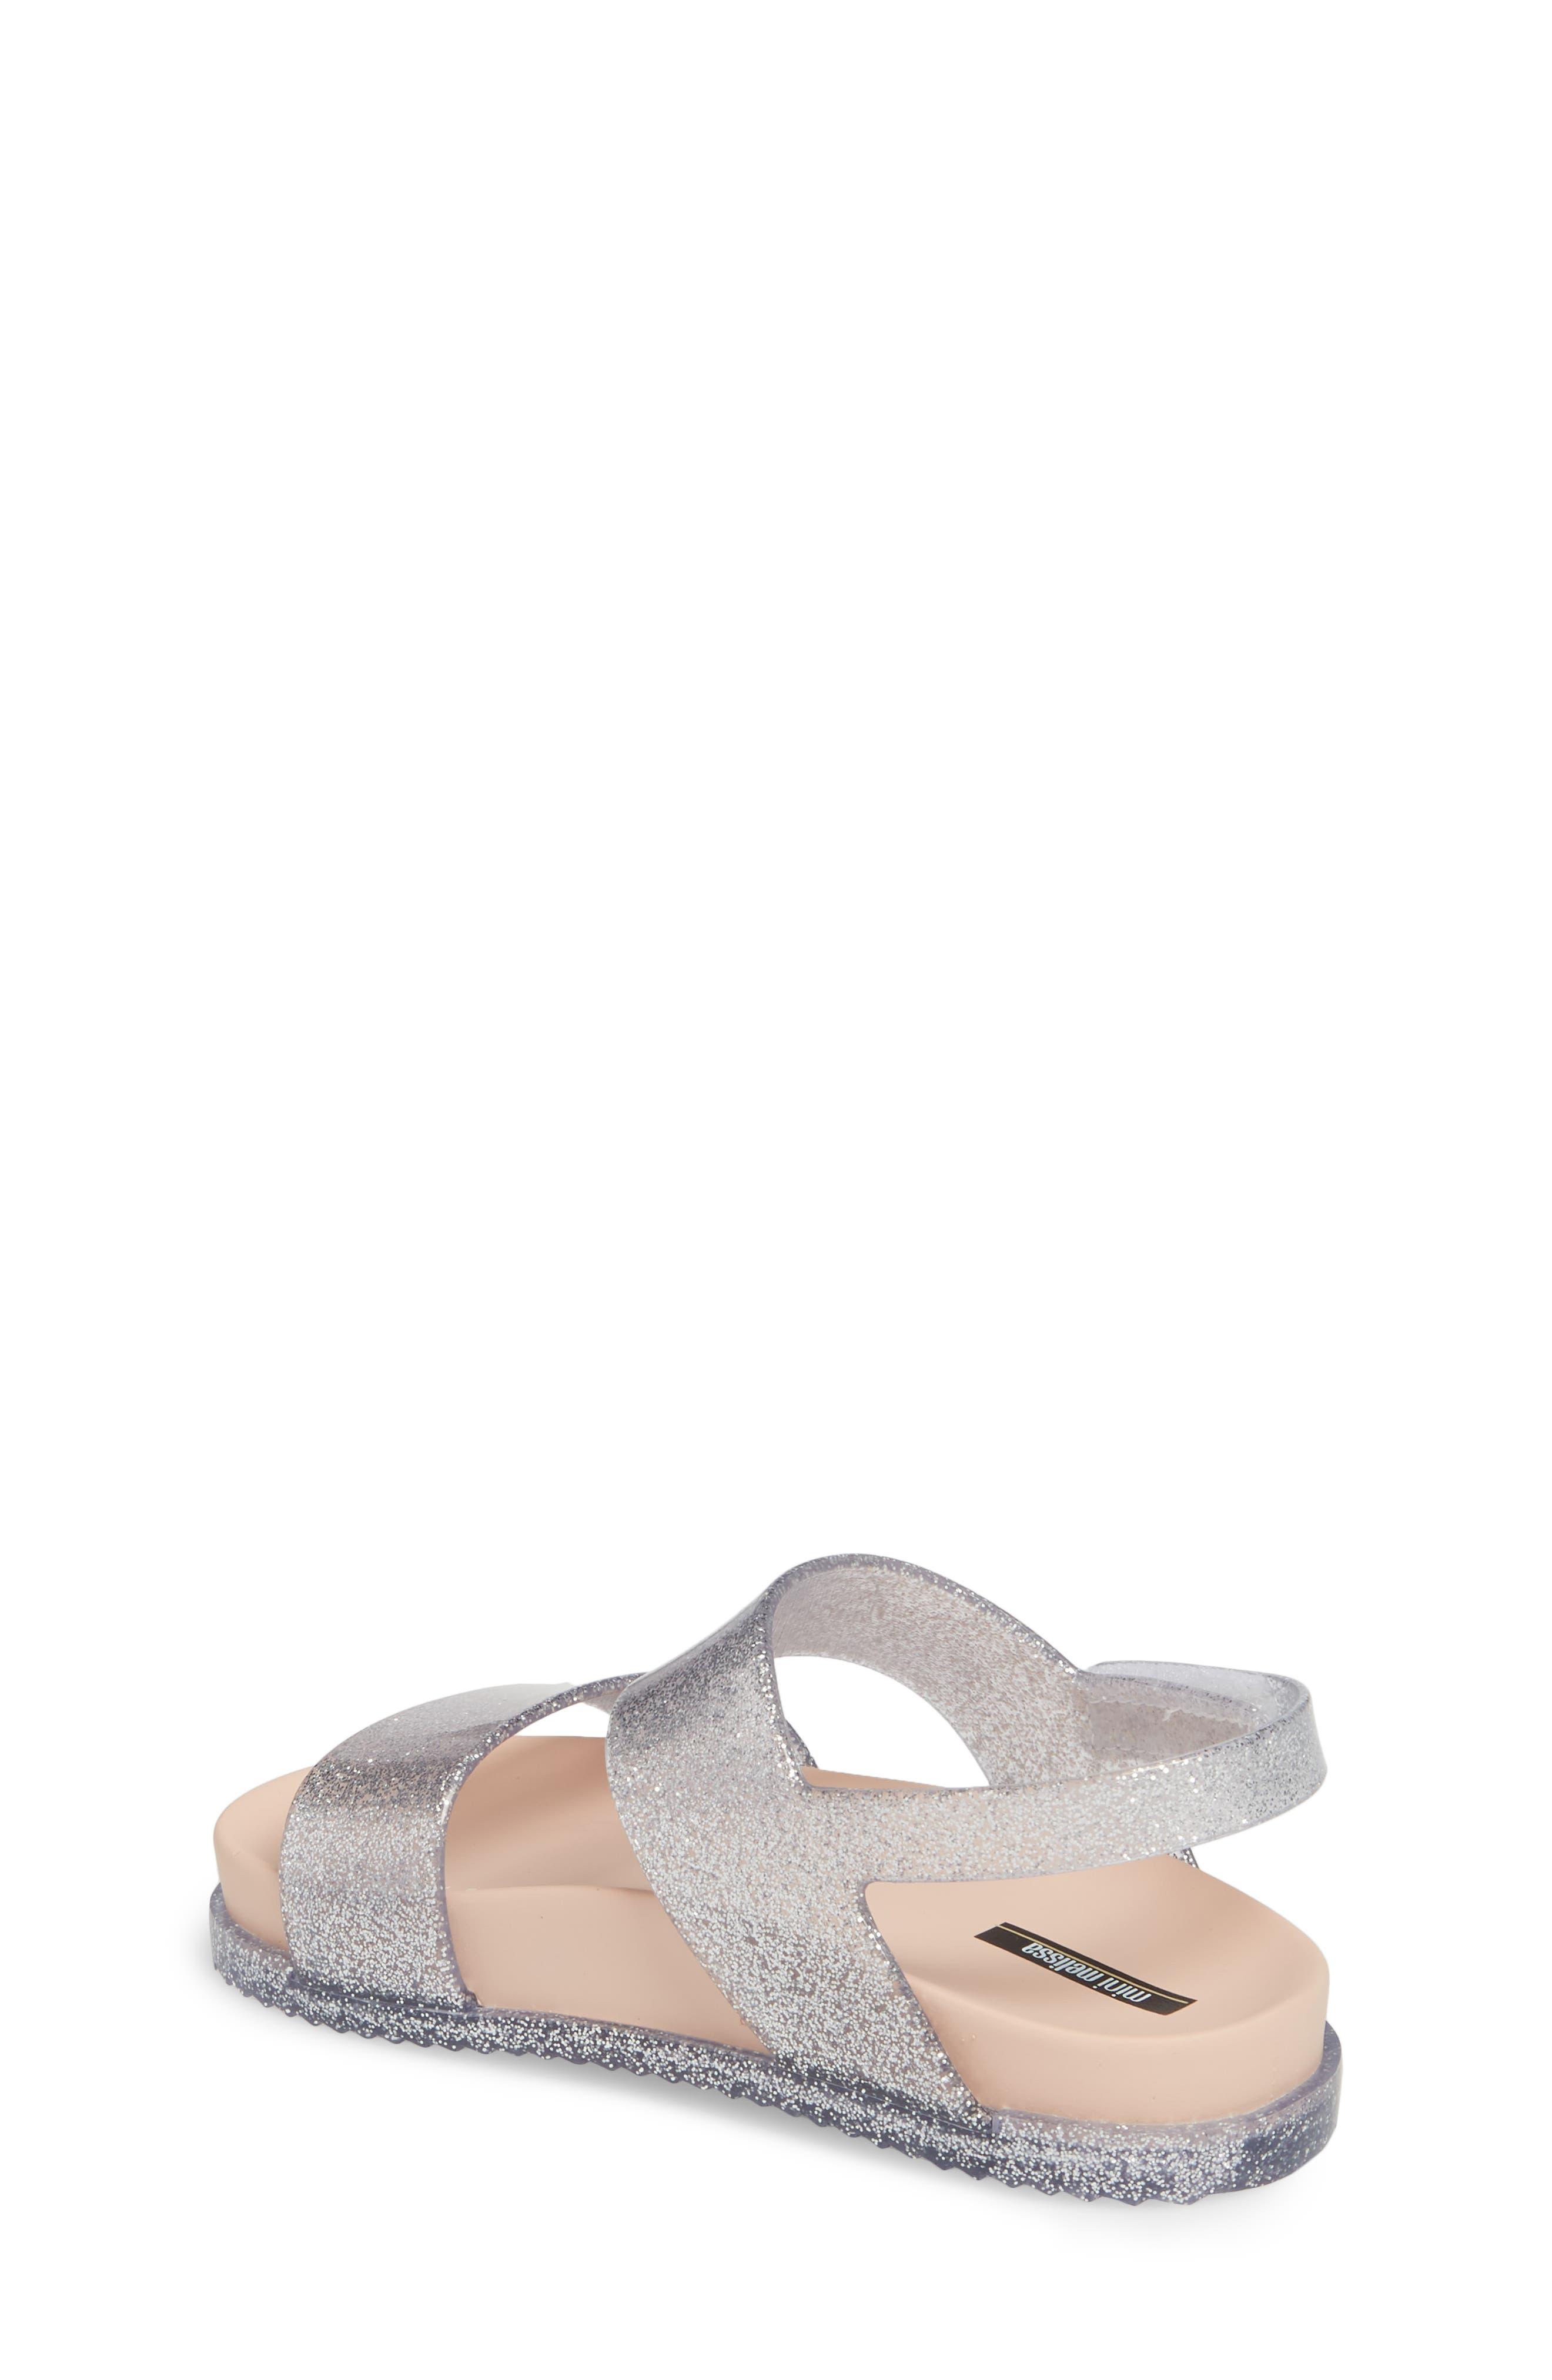 toddler girls' mini melissa shoes (sizes 7.5-12)   nordstrom